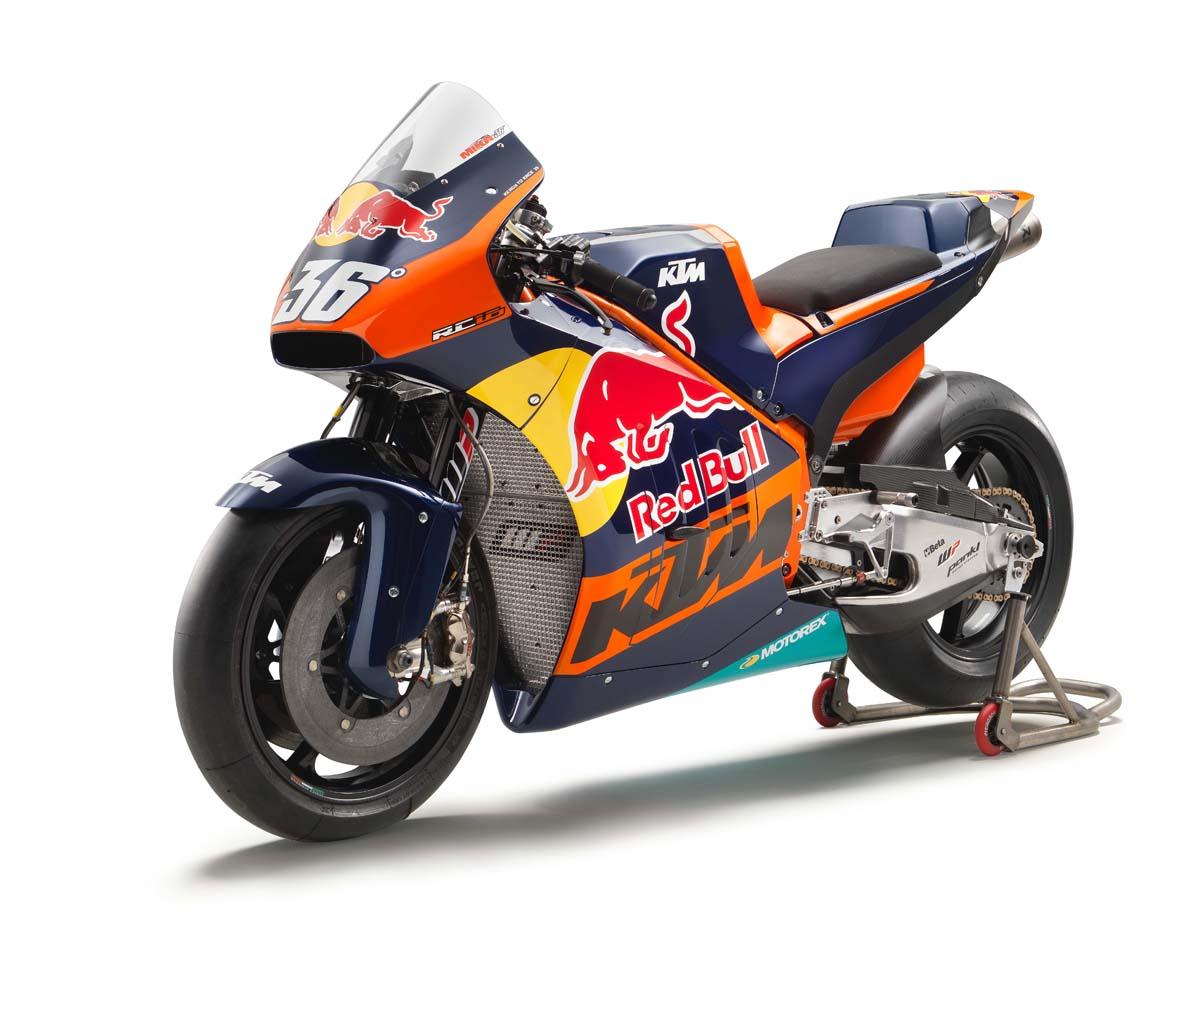 KTM RC16 配色正式亮相